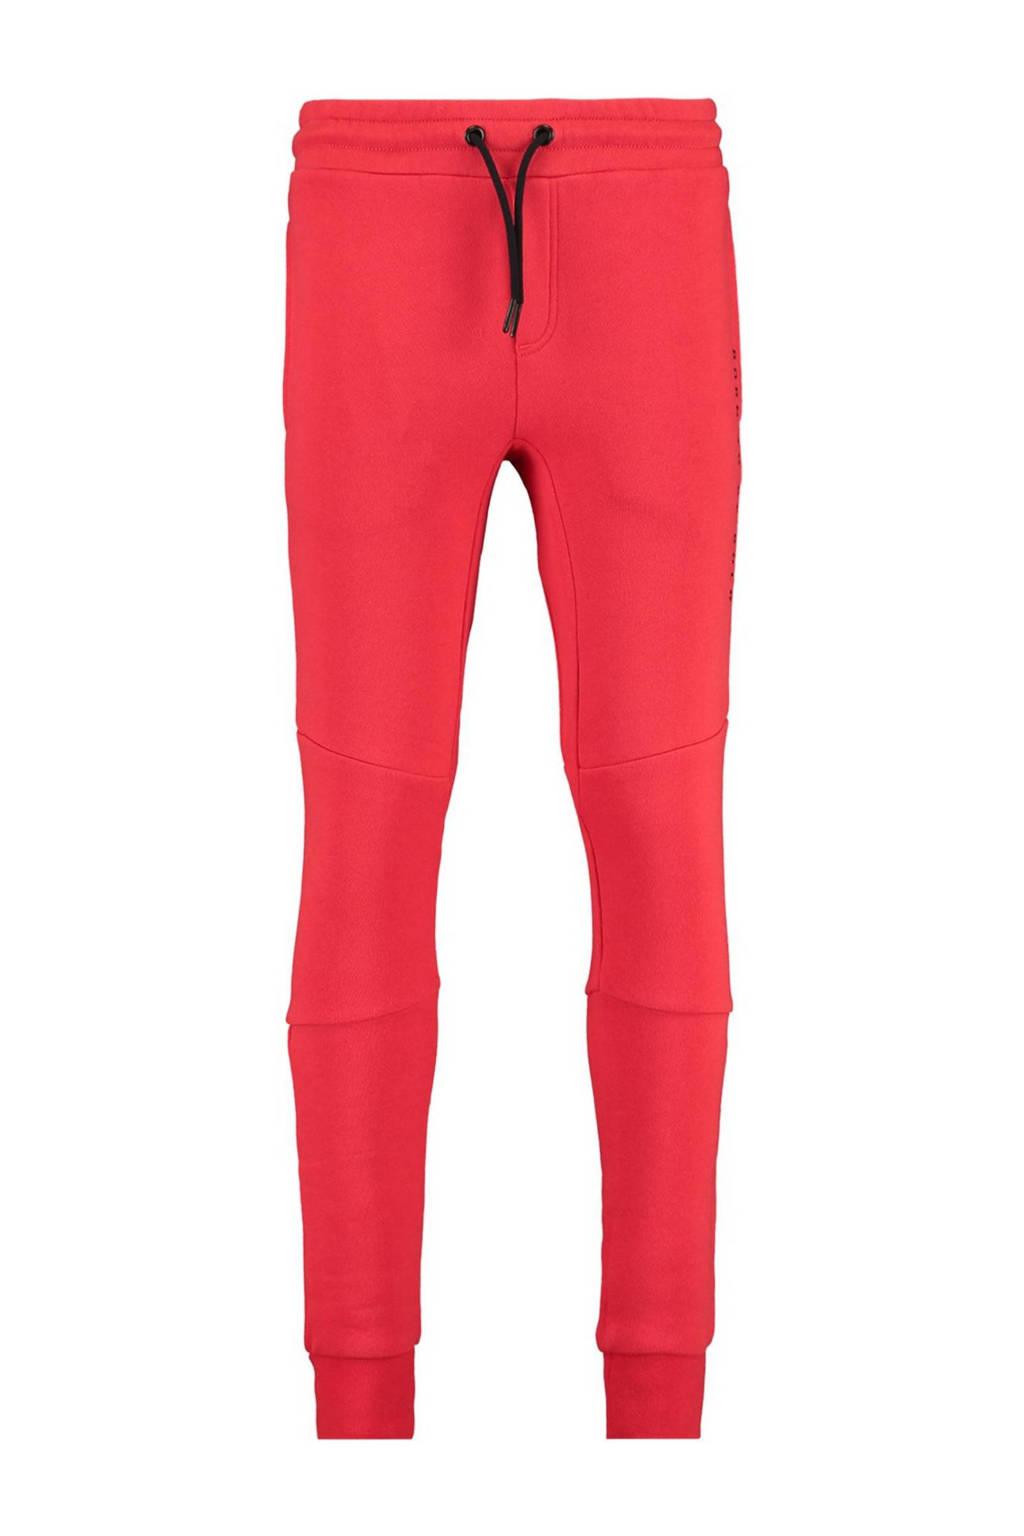 CoolCat Junior slim fit joggingbroek Cris met tekst rood, Rood